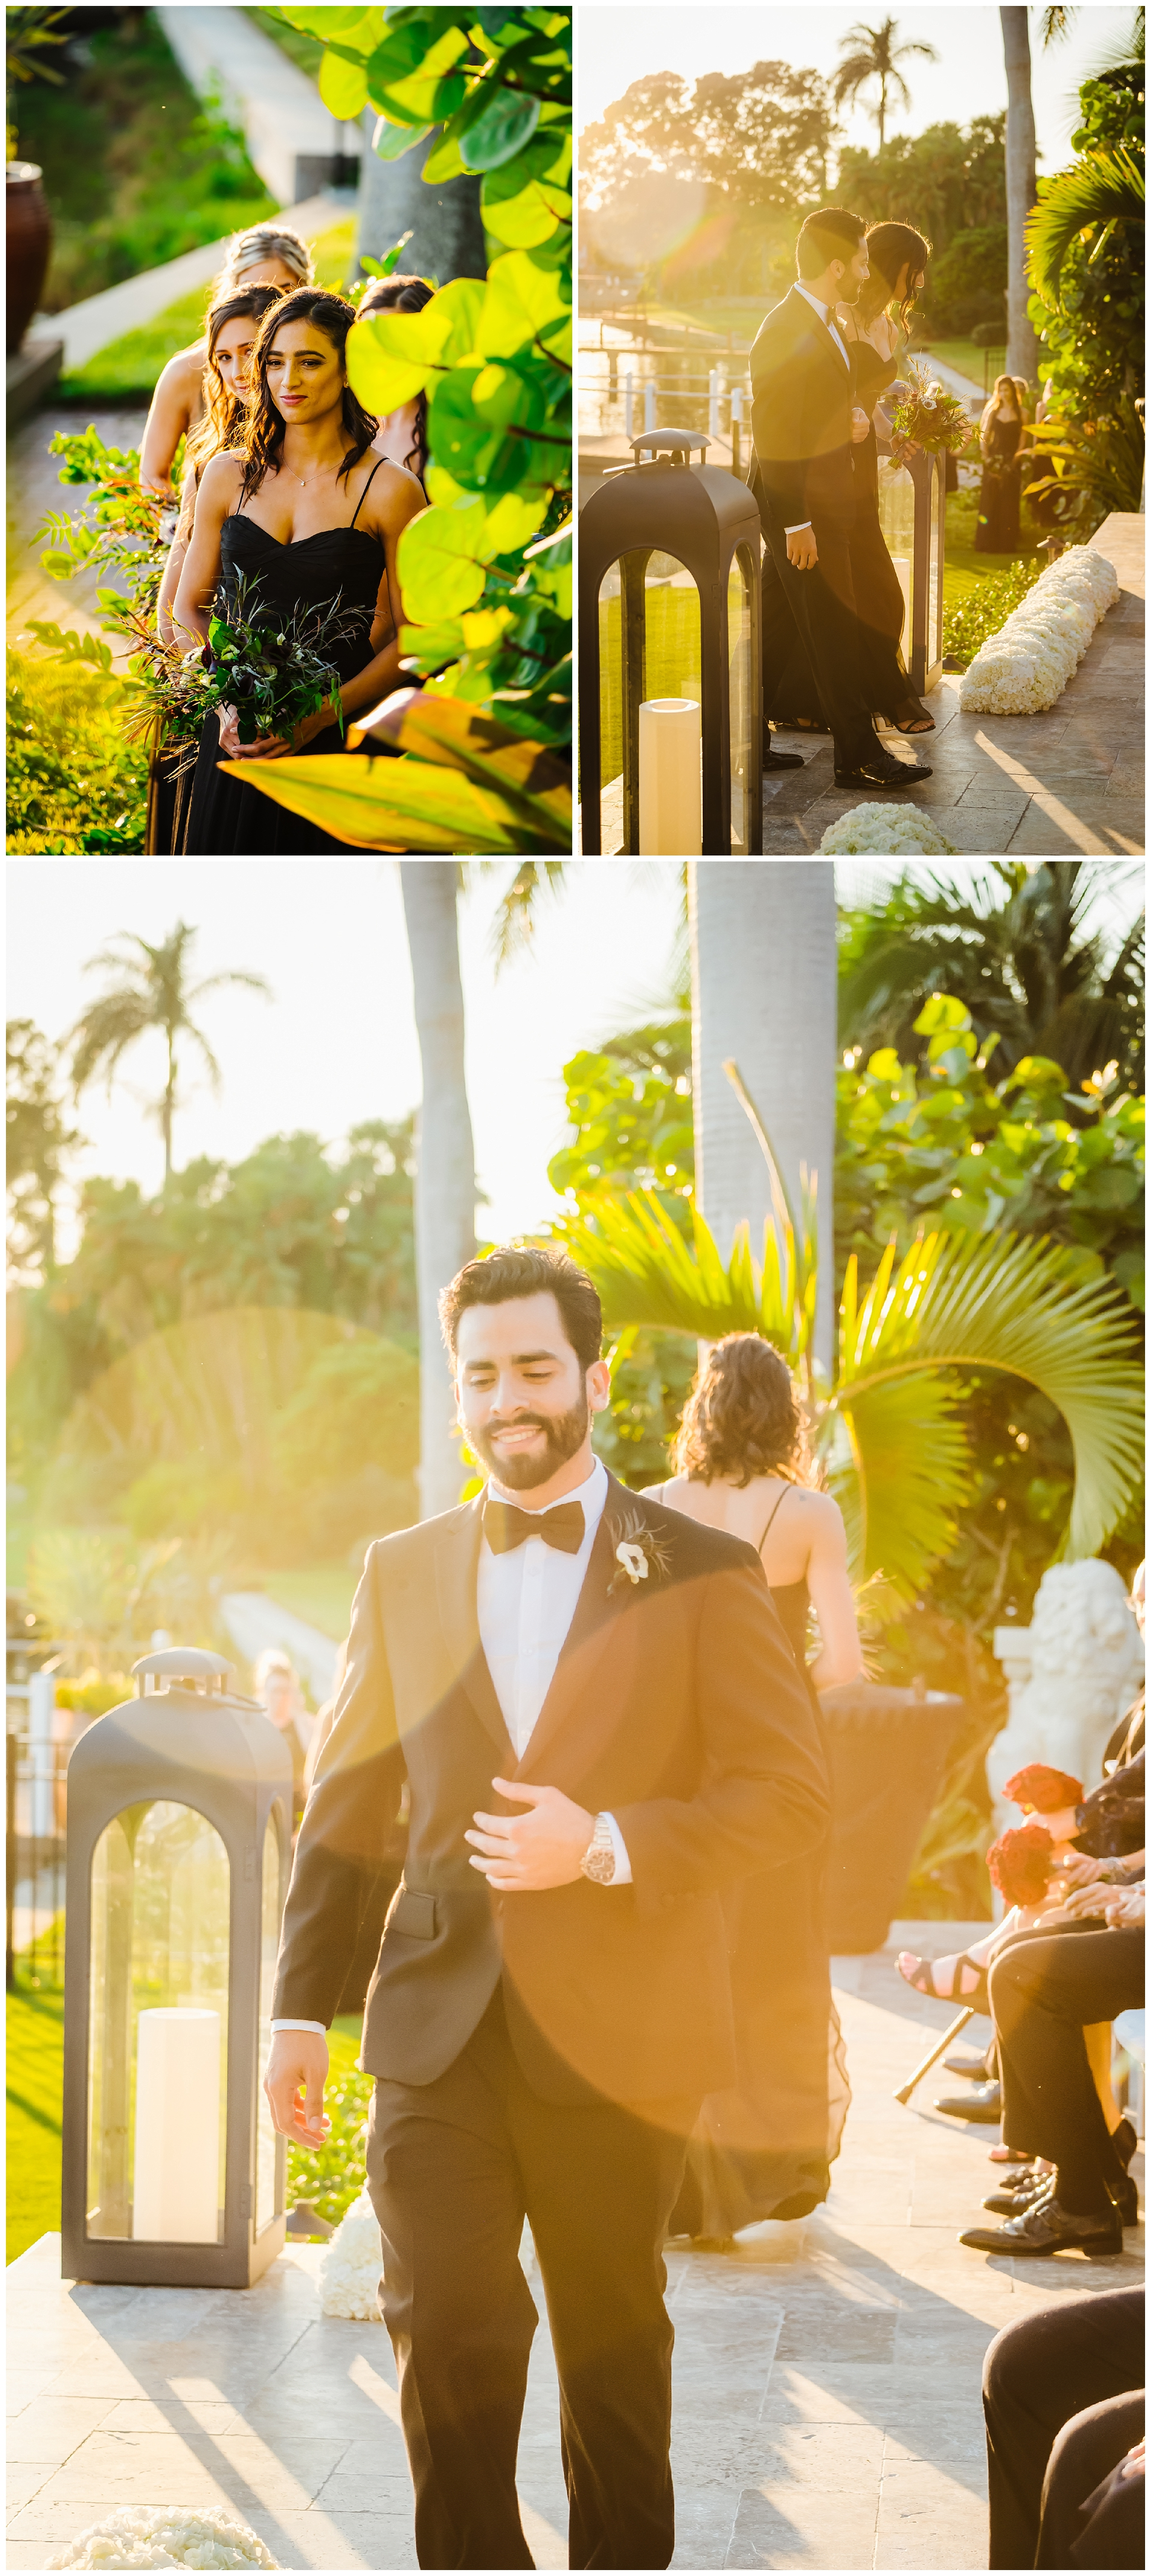 st-pete-wedding-photographer-backyard-luxury-snell-isle-vinoy_0033.jpg